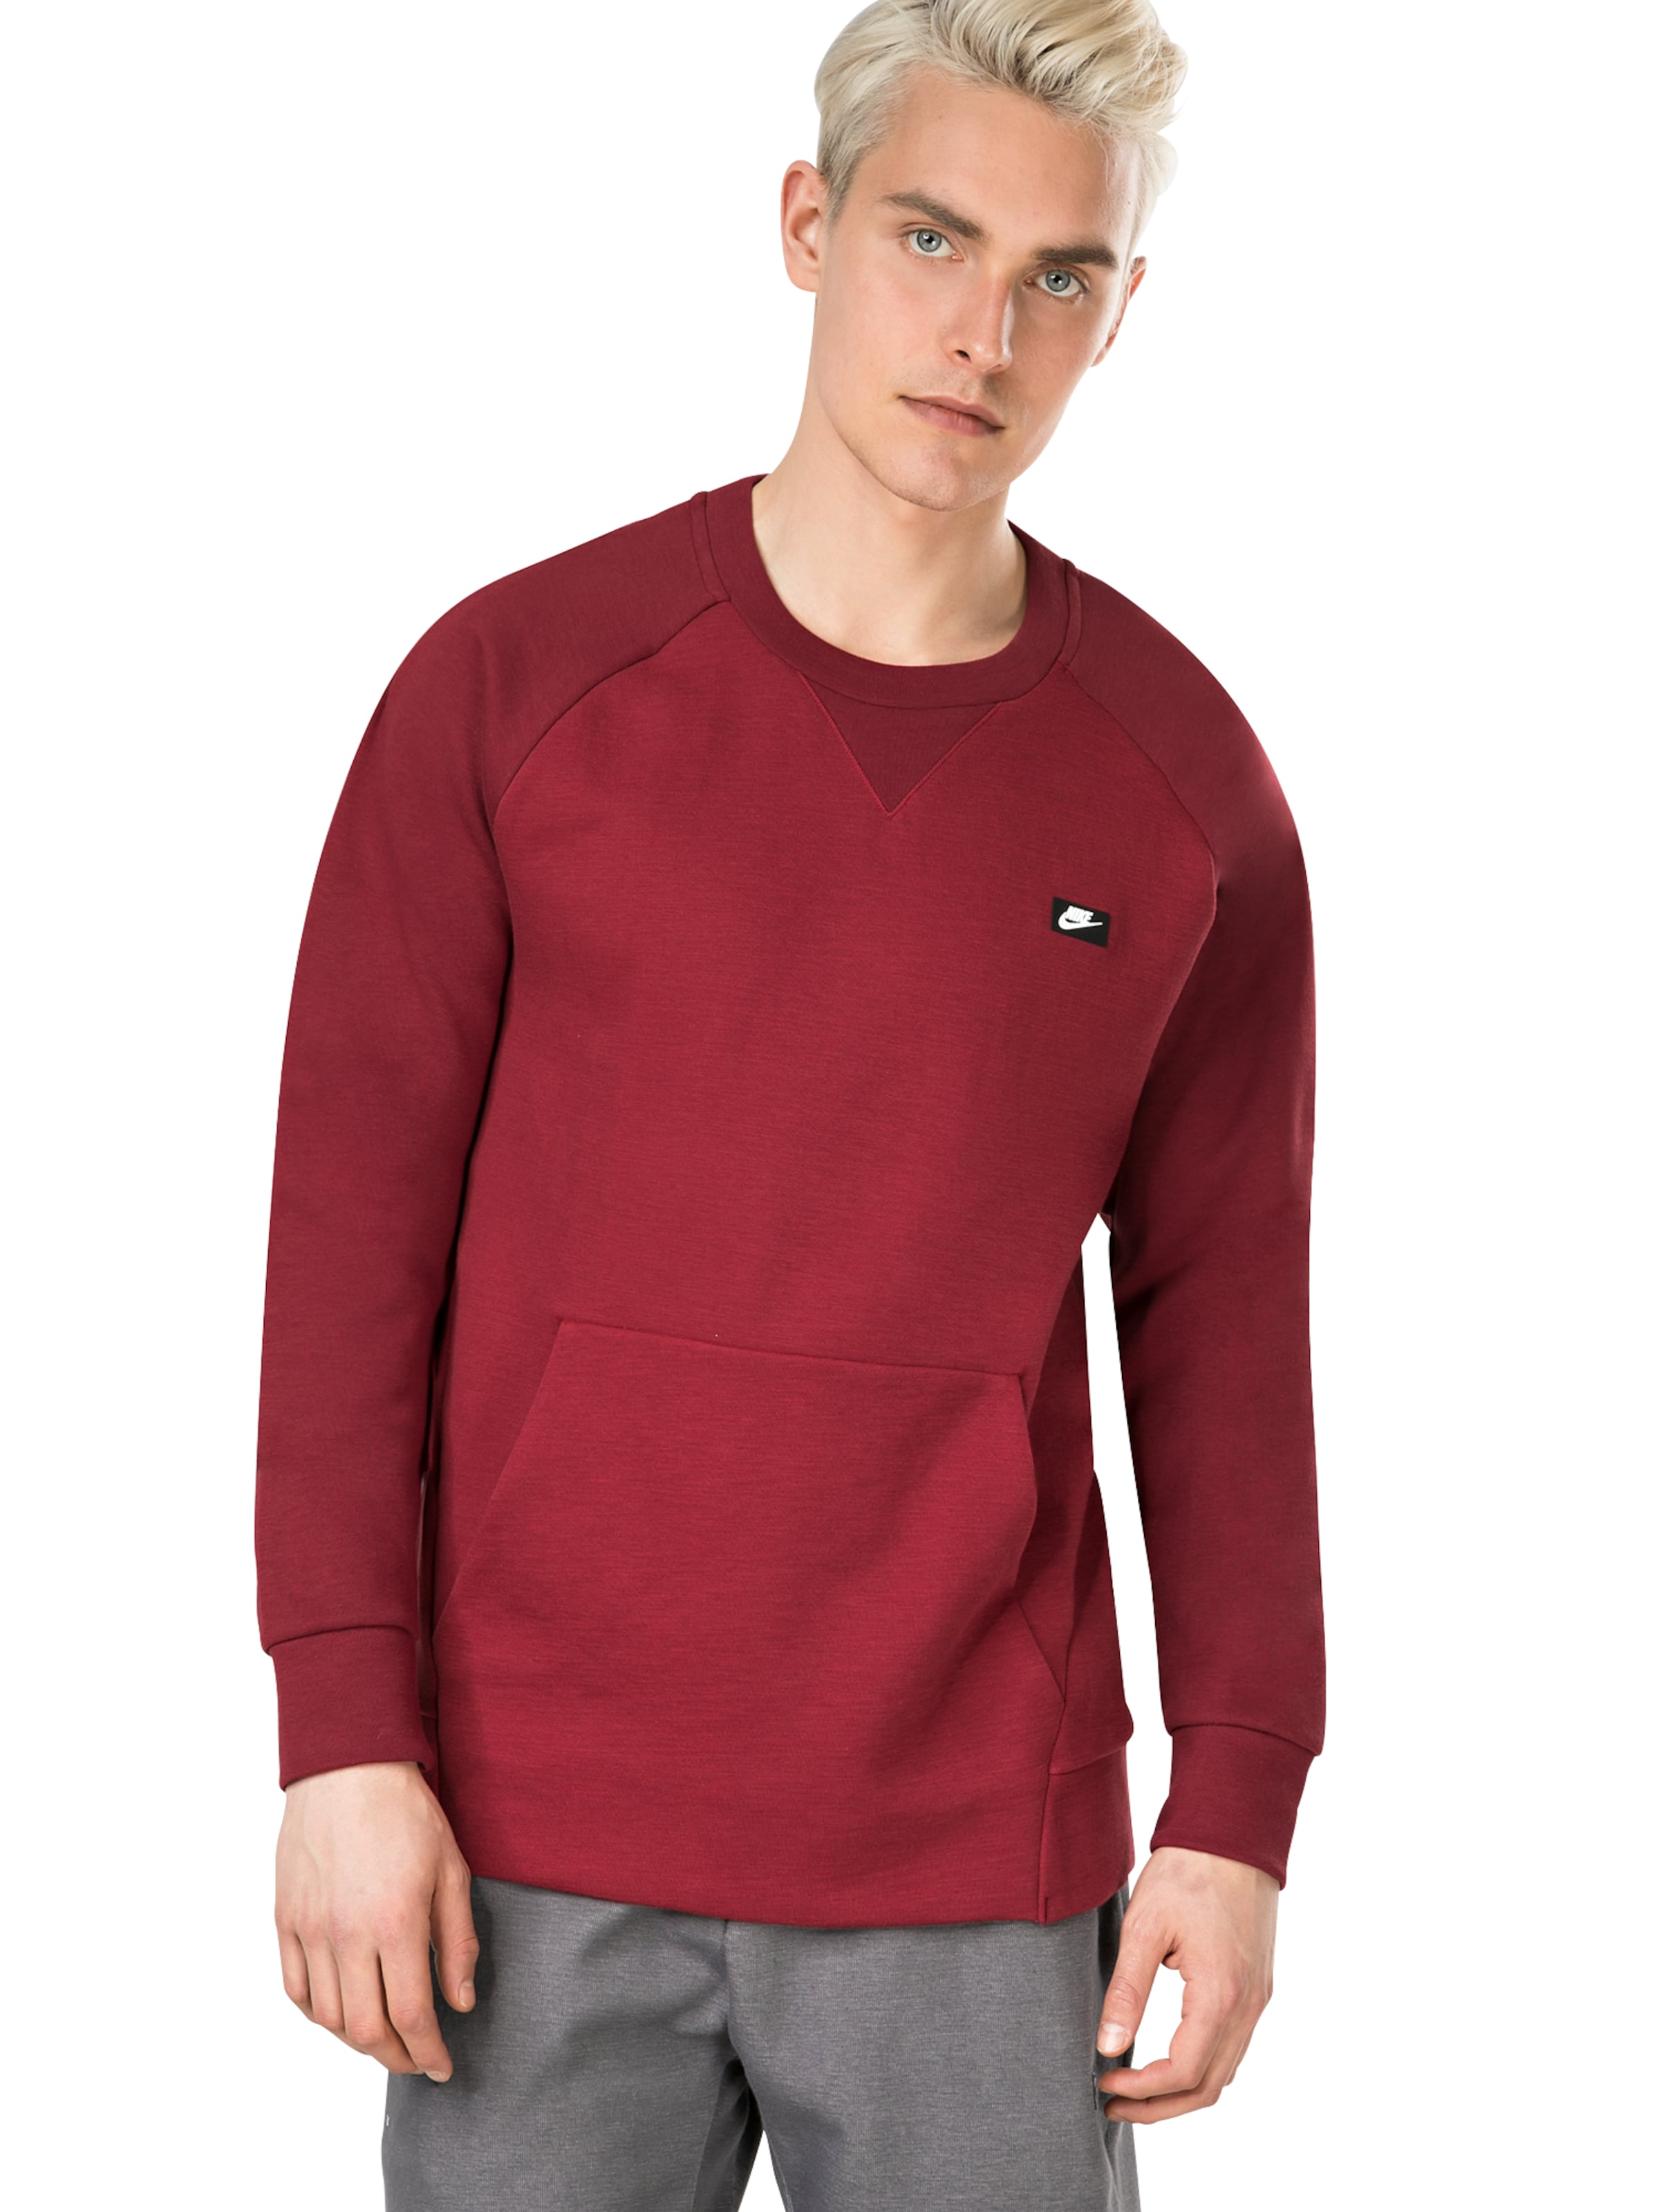 Sportswear BurgunderWeinrot Sweatshirt In BurgunderWeinrot In Nike Sweatshirt Sportswear Nike Nike rCxodeB